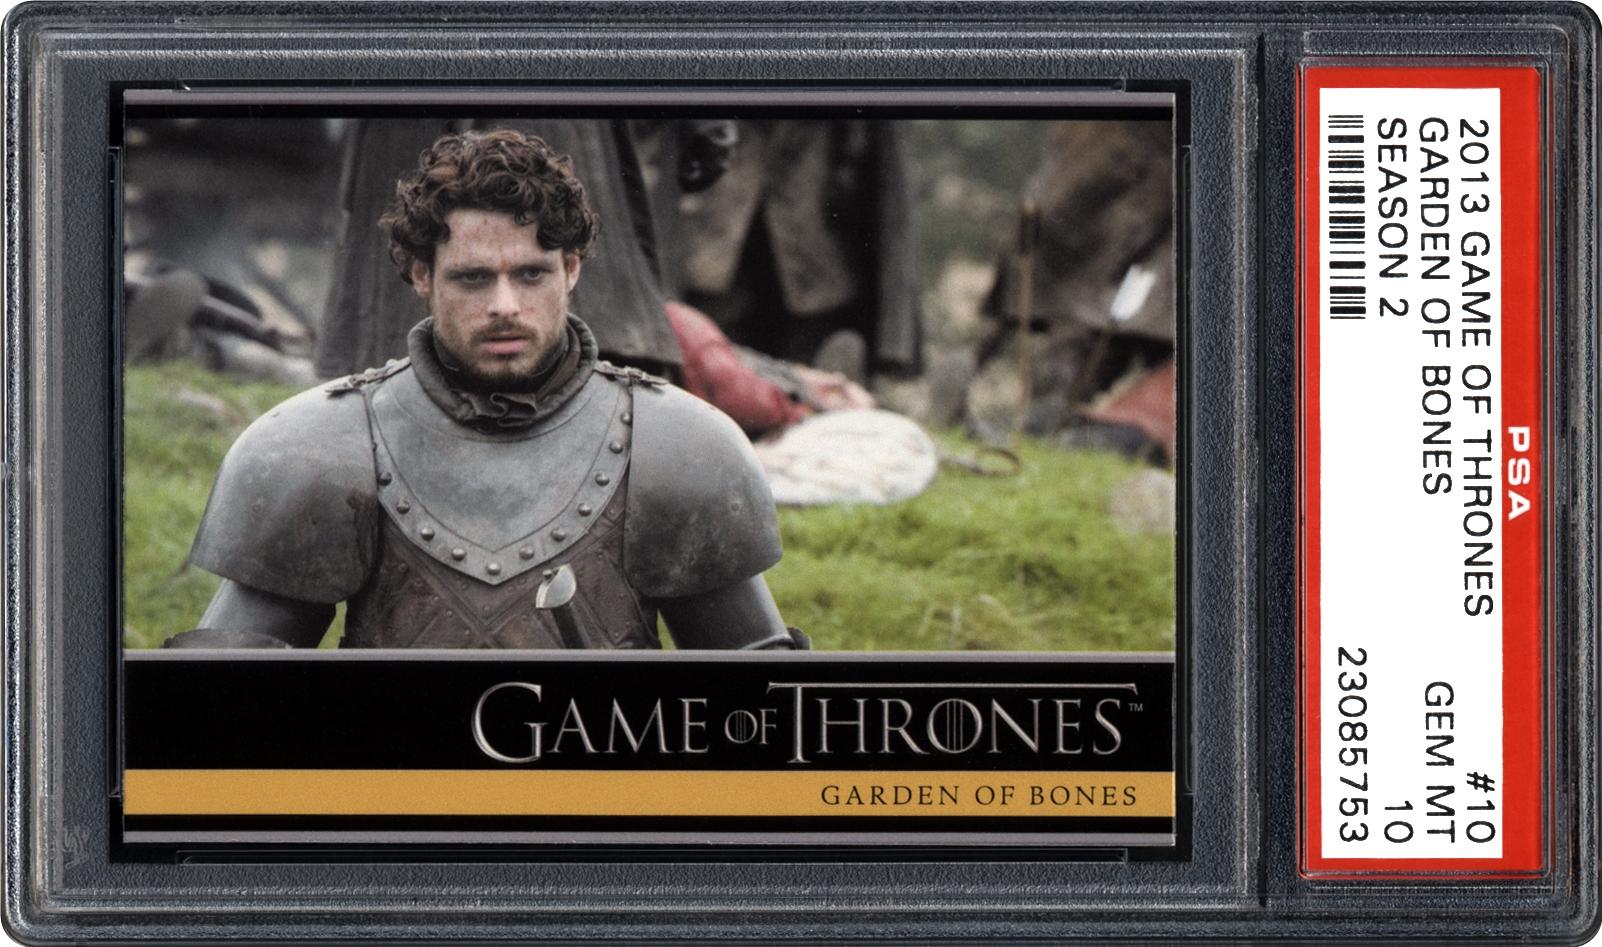 2013 Rittenhouse Game Of Thrones Season 2 Garden Of Bones Psa Cardfacts